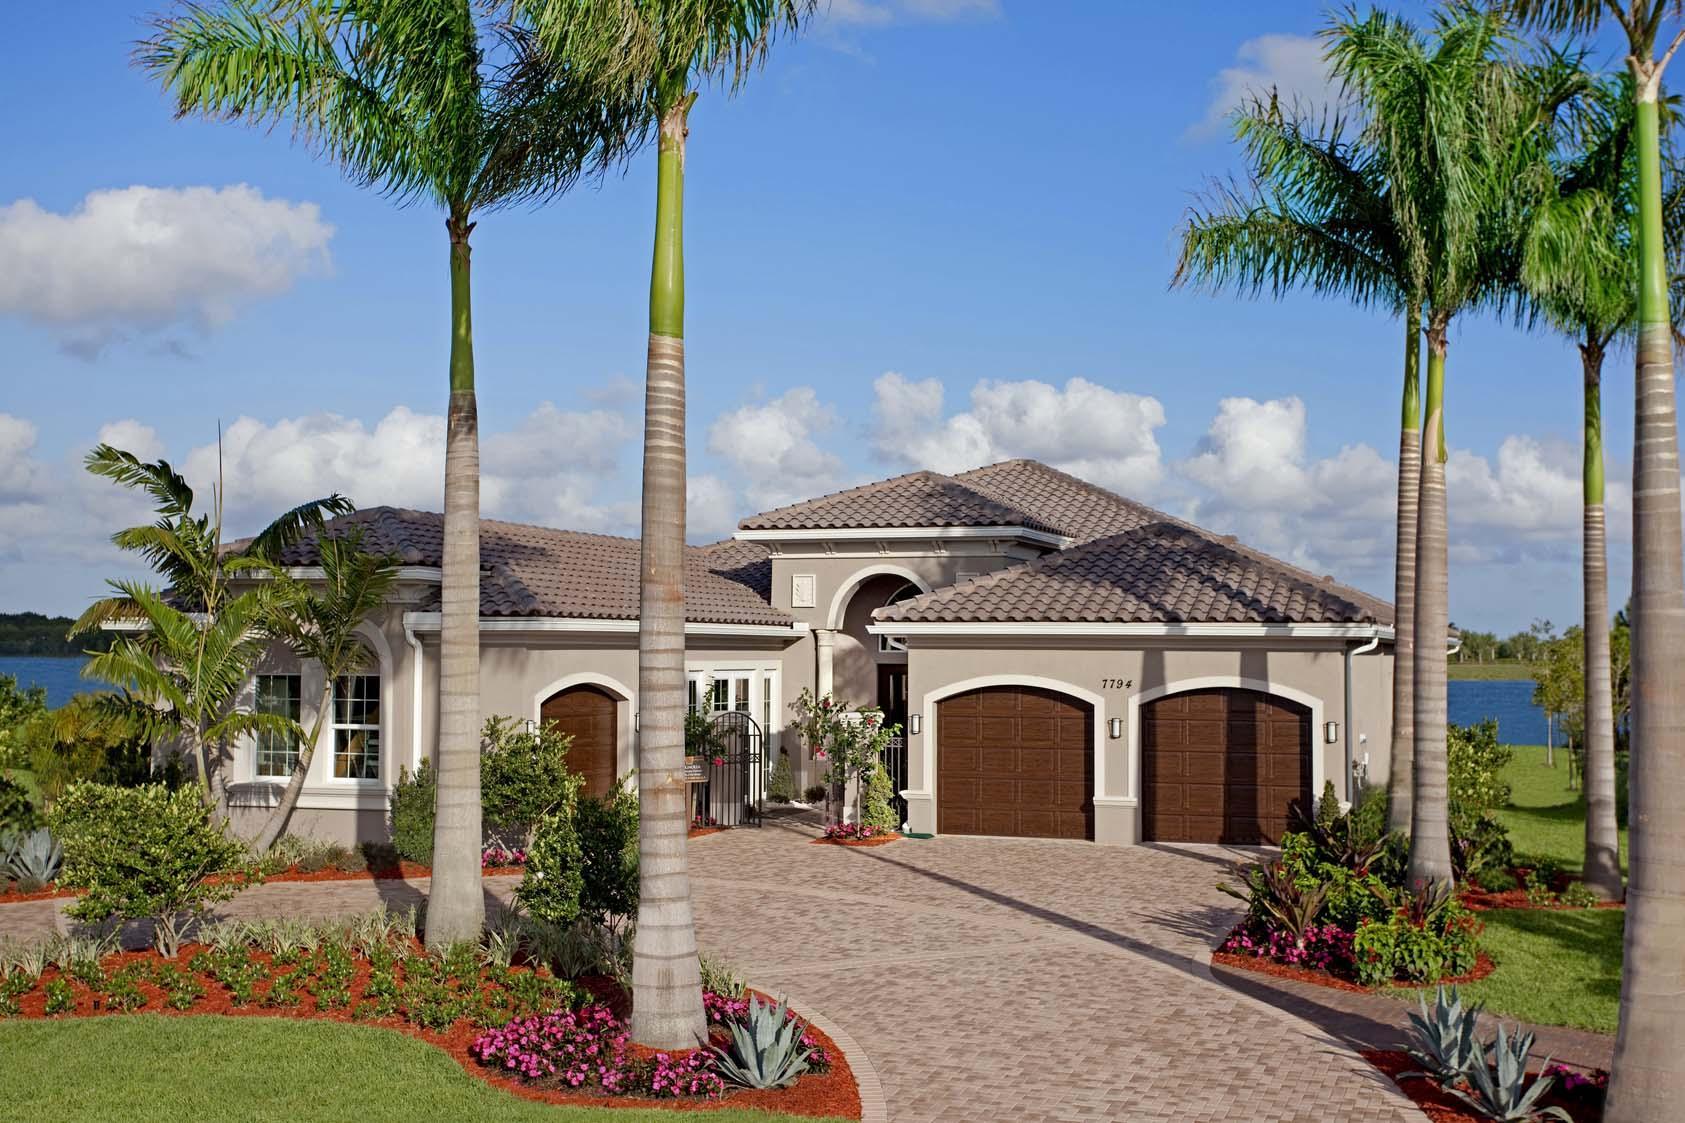 West Palm Beach Fl 33412 803 551 Trulia Estimate Refinance Your Home 7636 Maywood Crest Dr